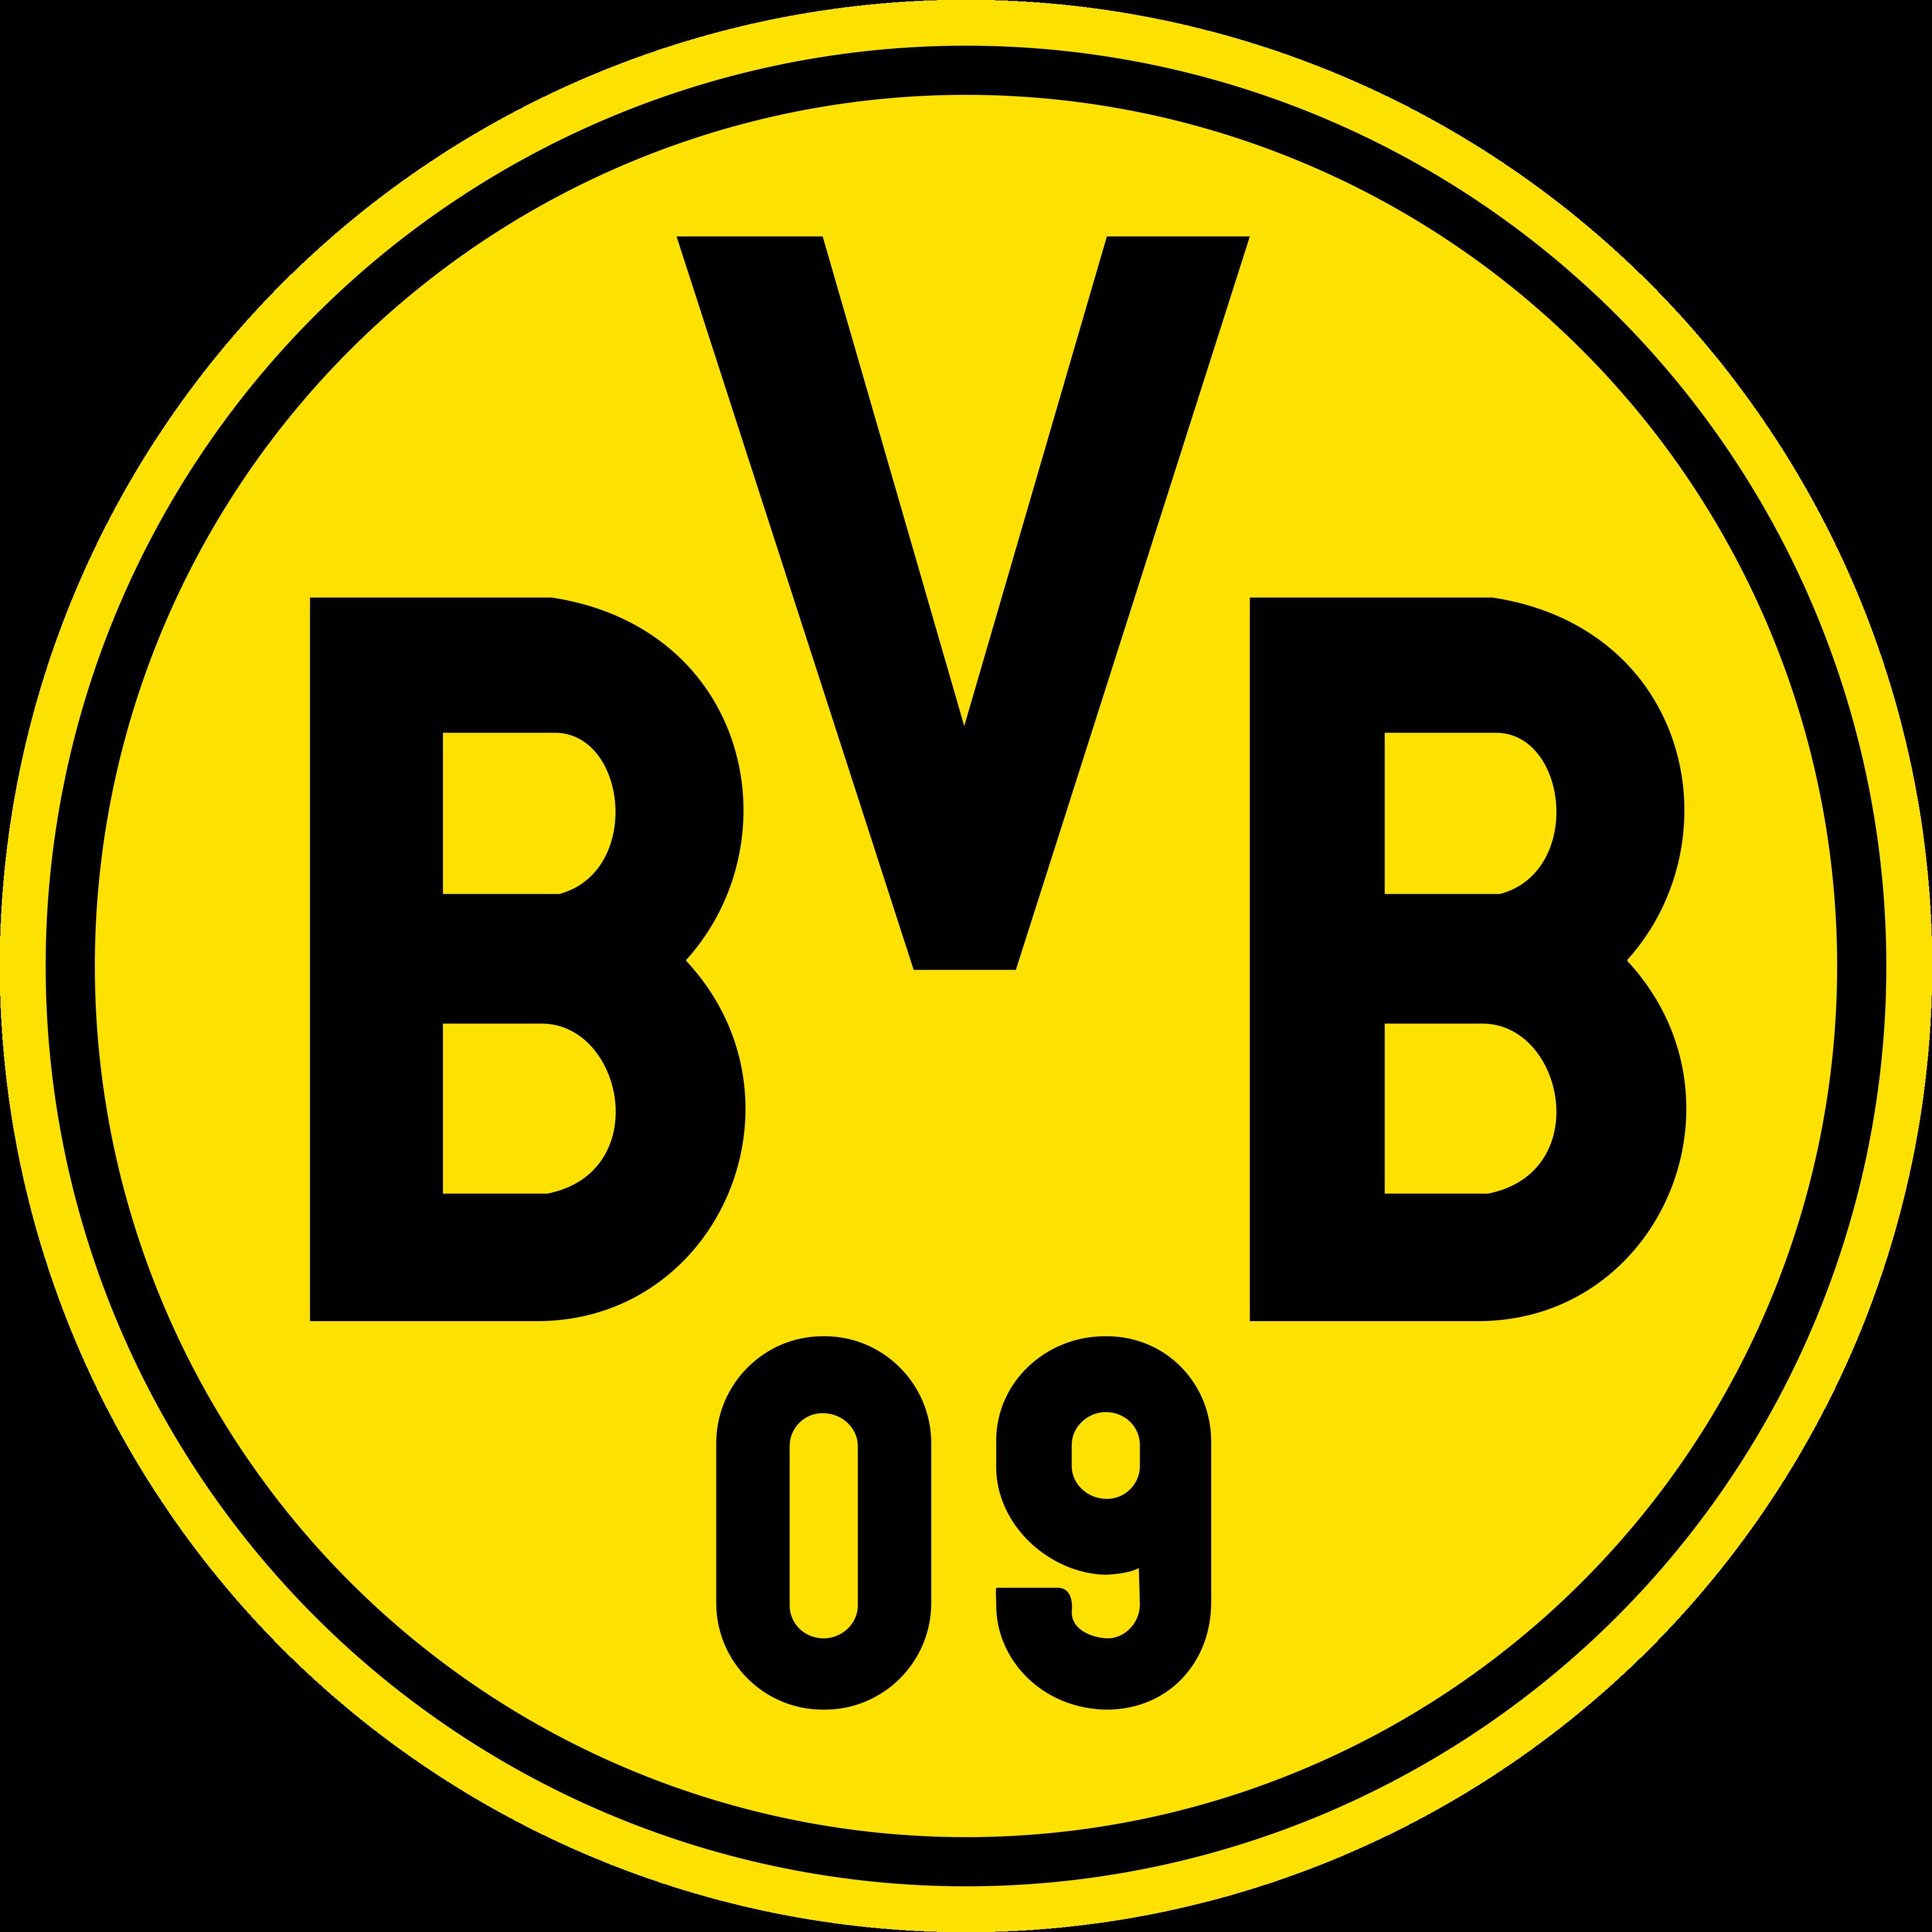 bvb borussia dortmund logo - Borussia Dortmund Logo